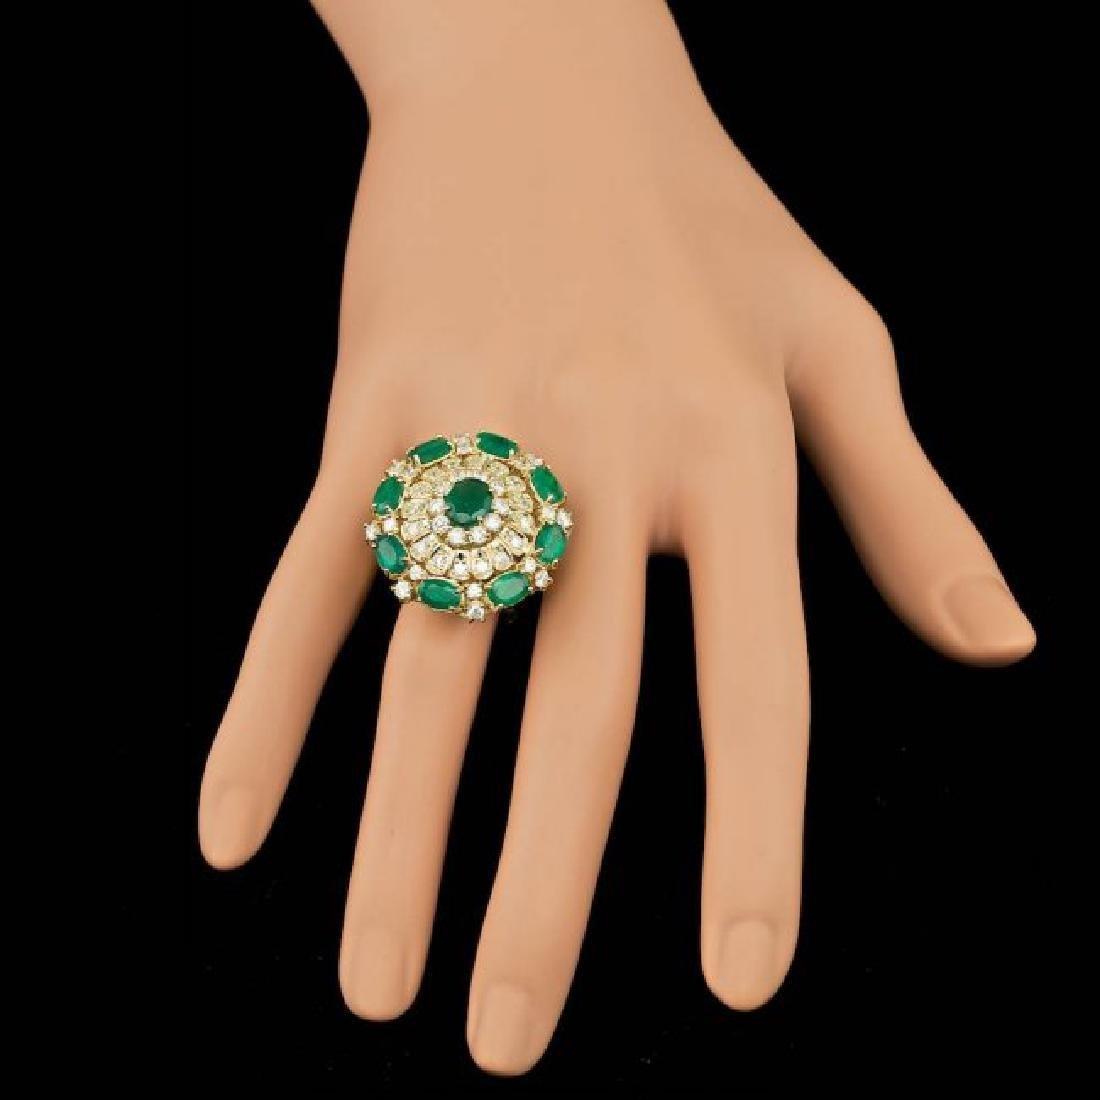 14k Gold 5.00ct Emerald 2.00ct Diamond Ring - 6